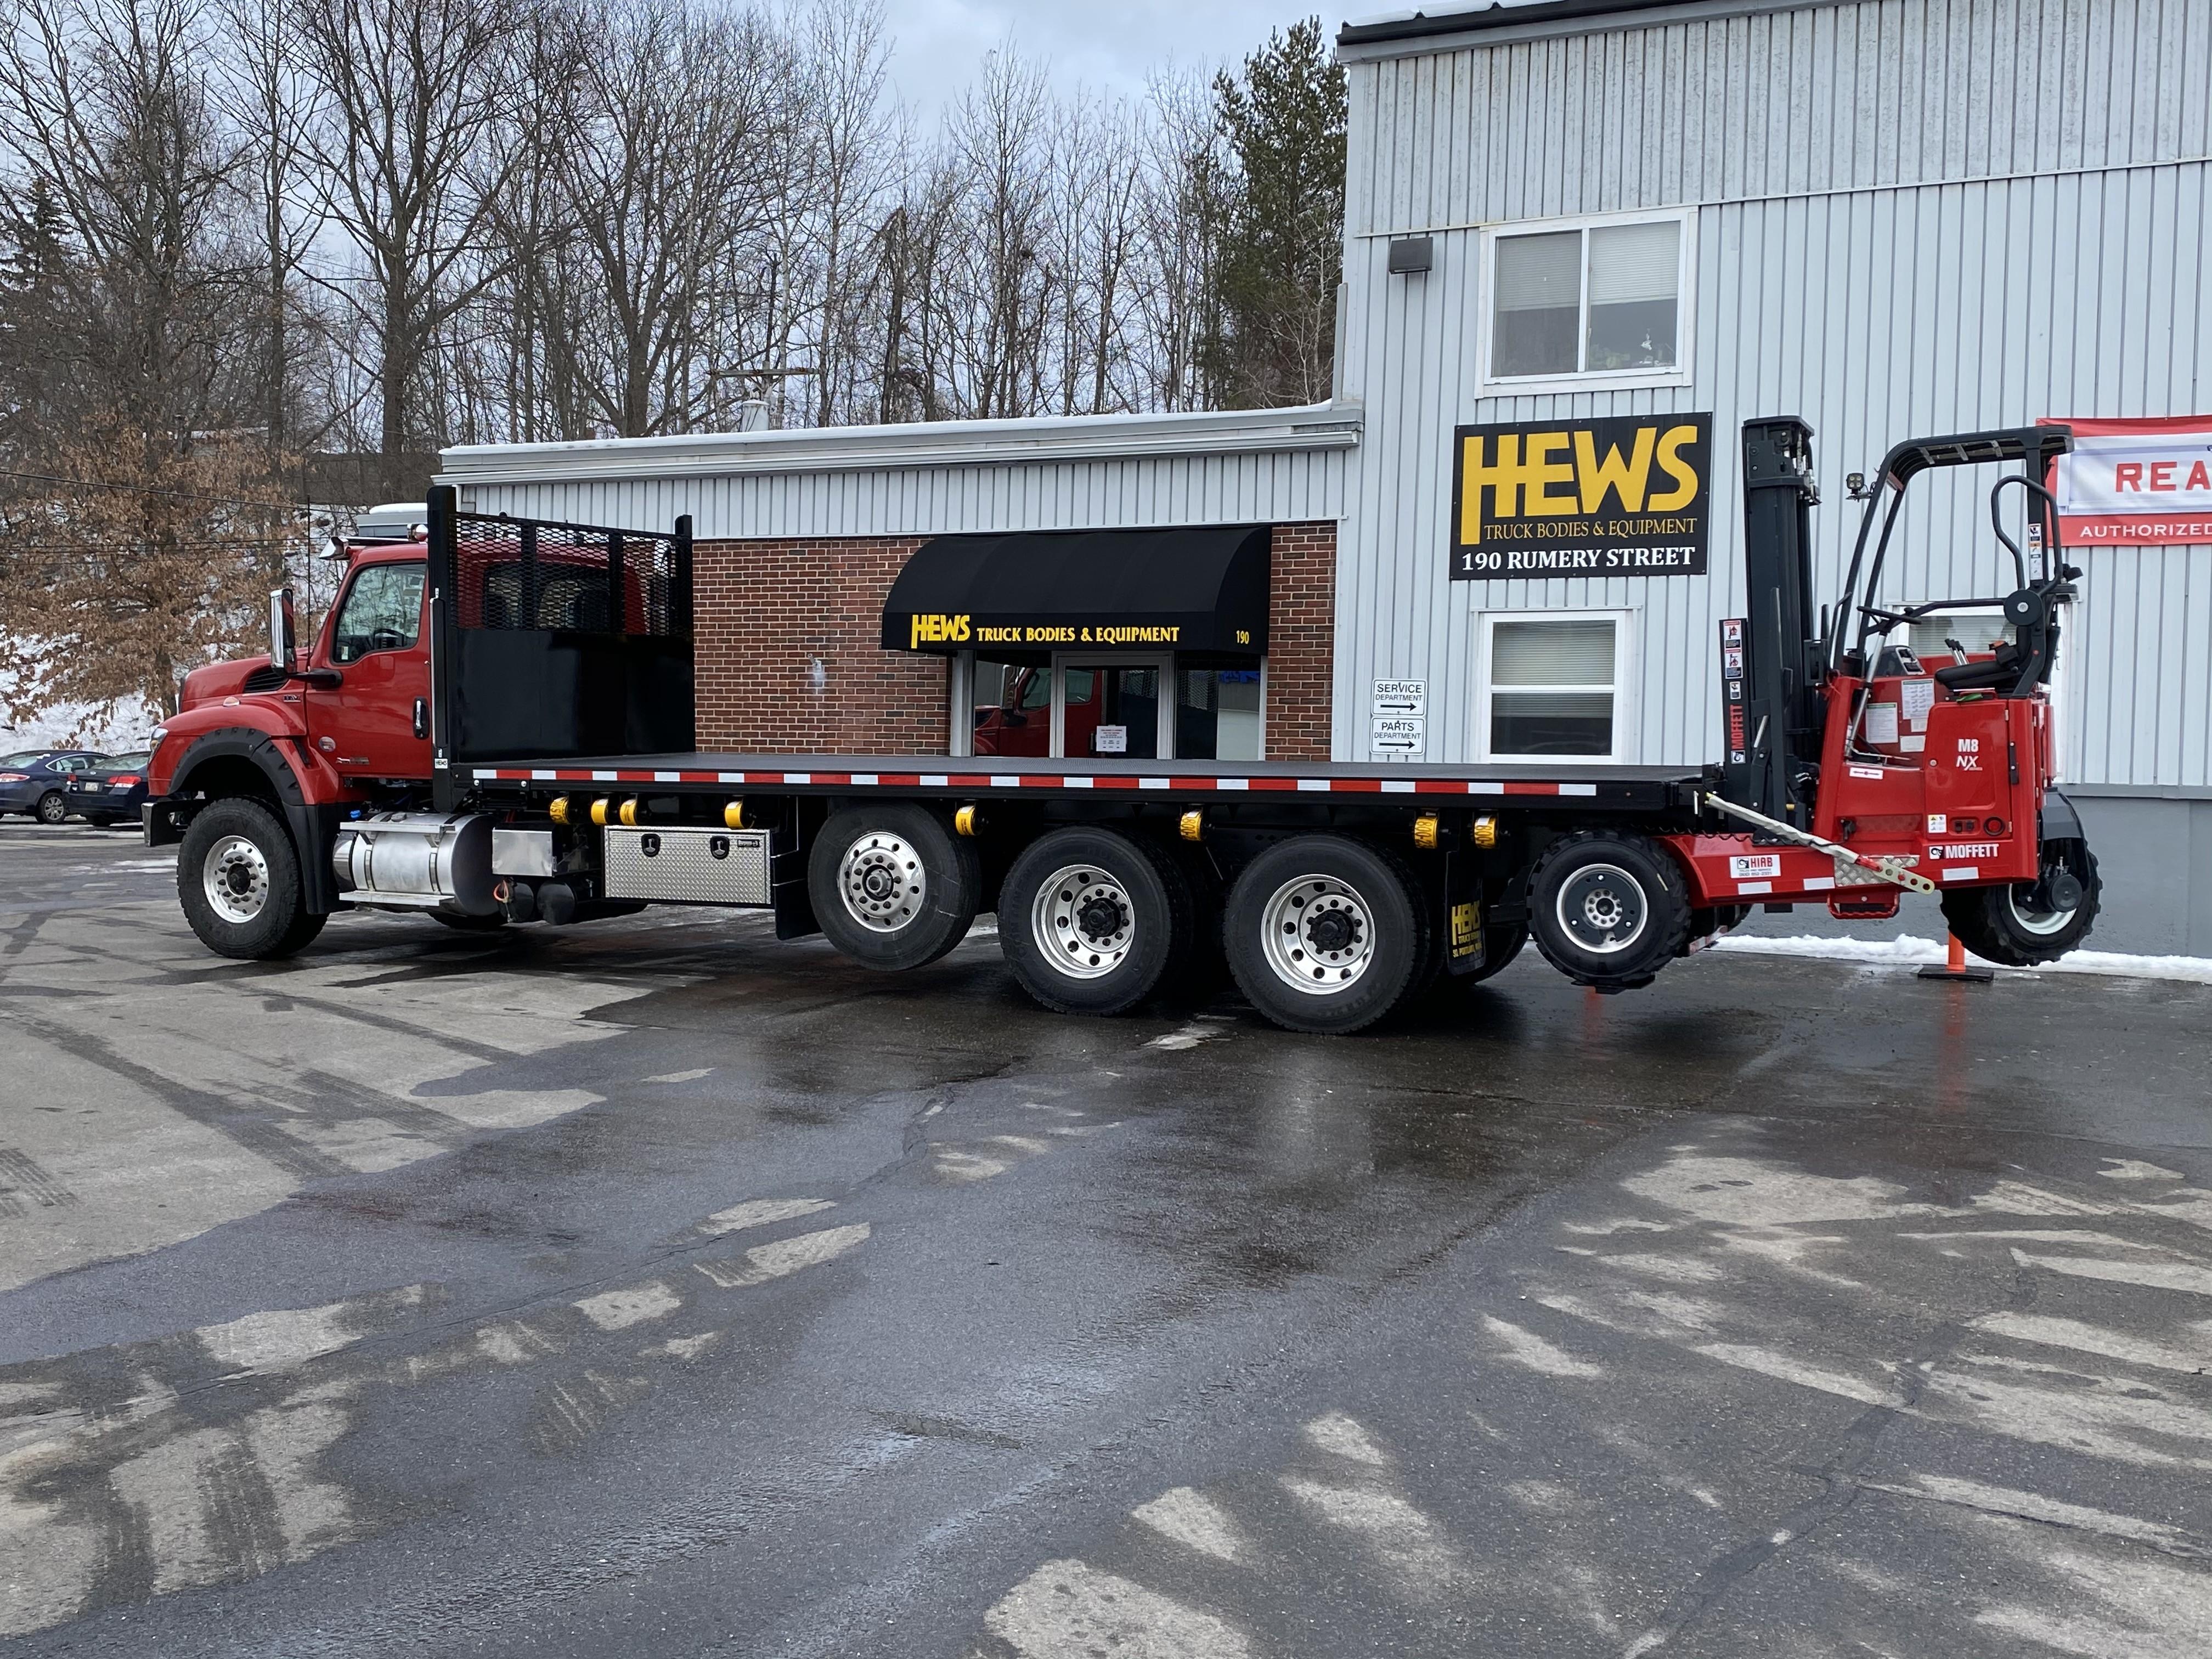 New, 0, Other, Hews Taskmaster Building Supply Platform with Moffett M8 55.4, Truck Bodies